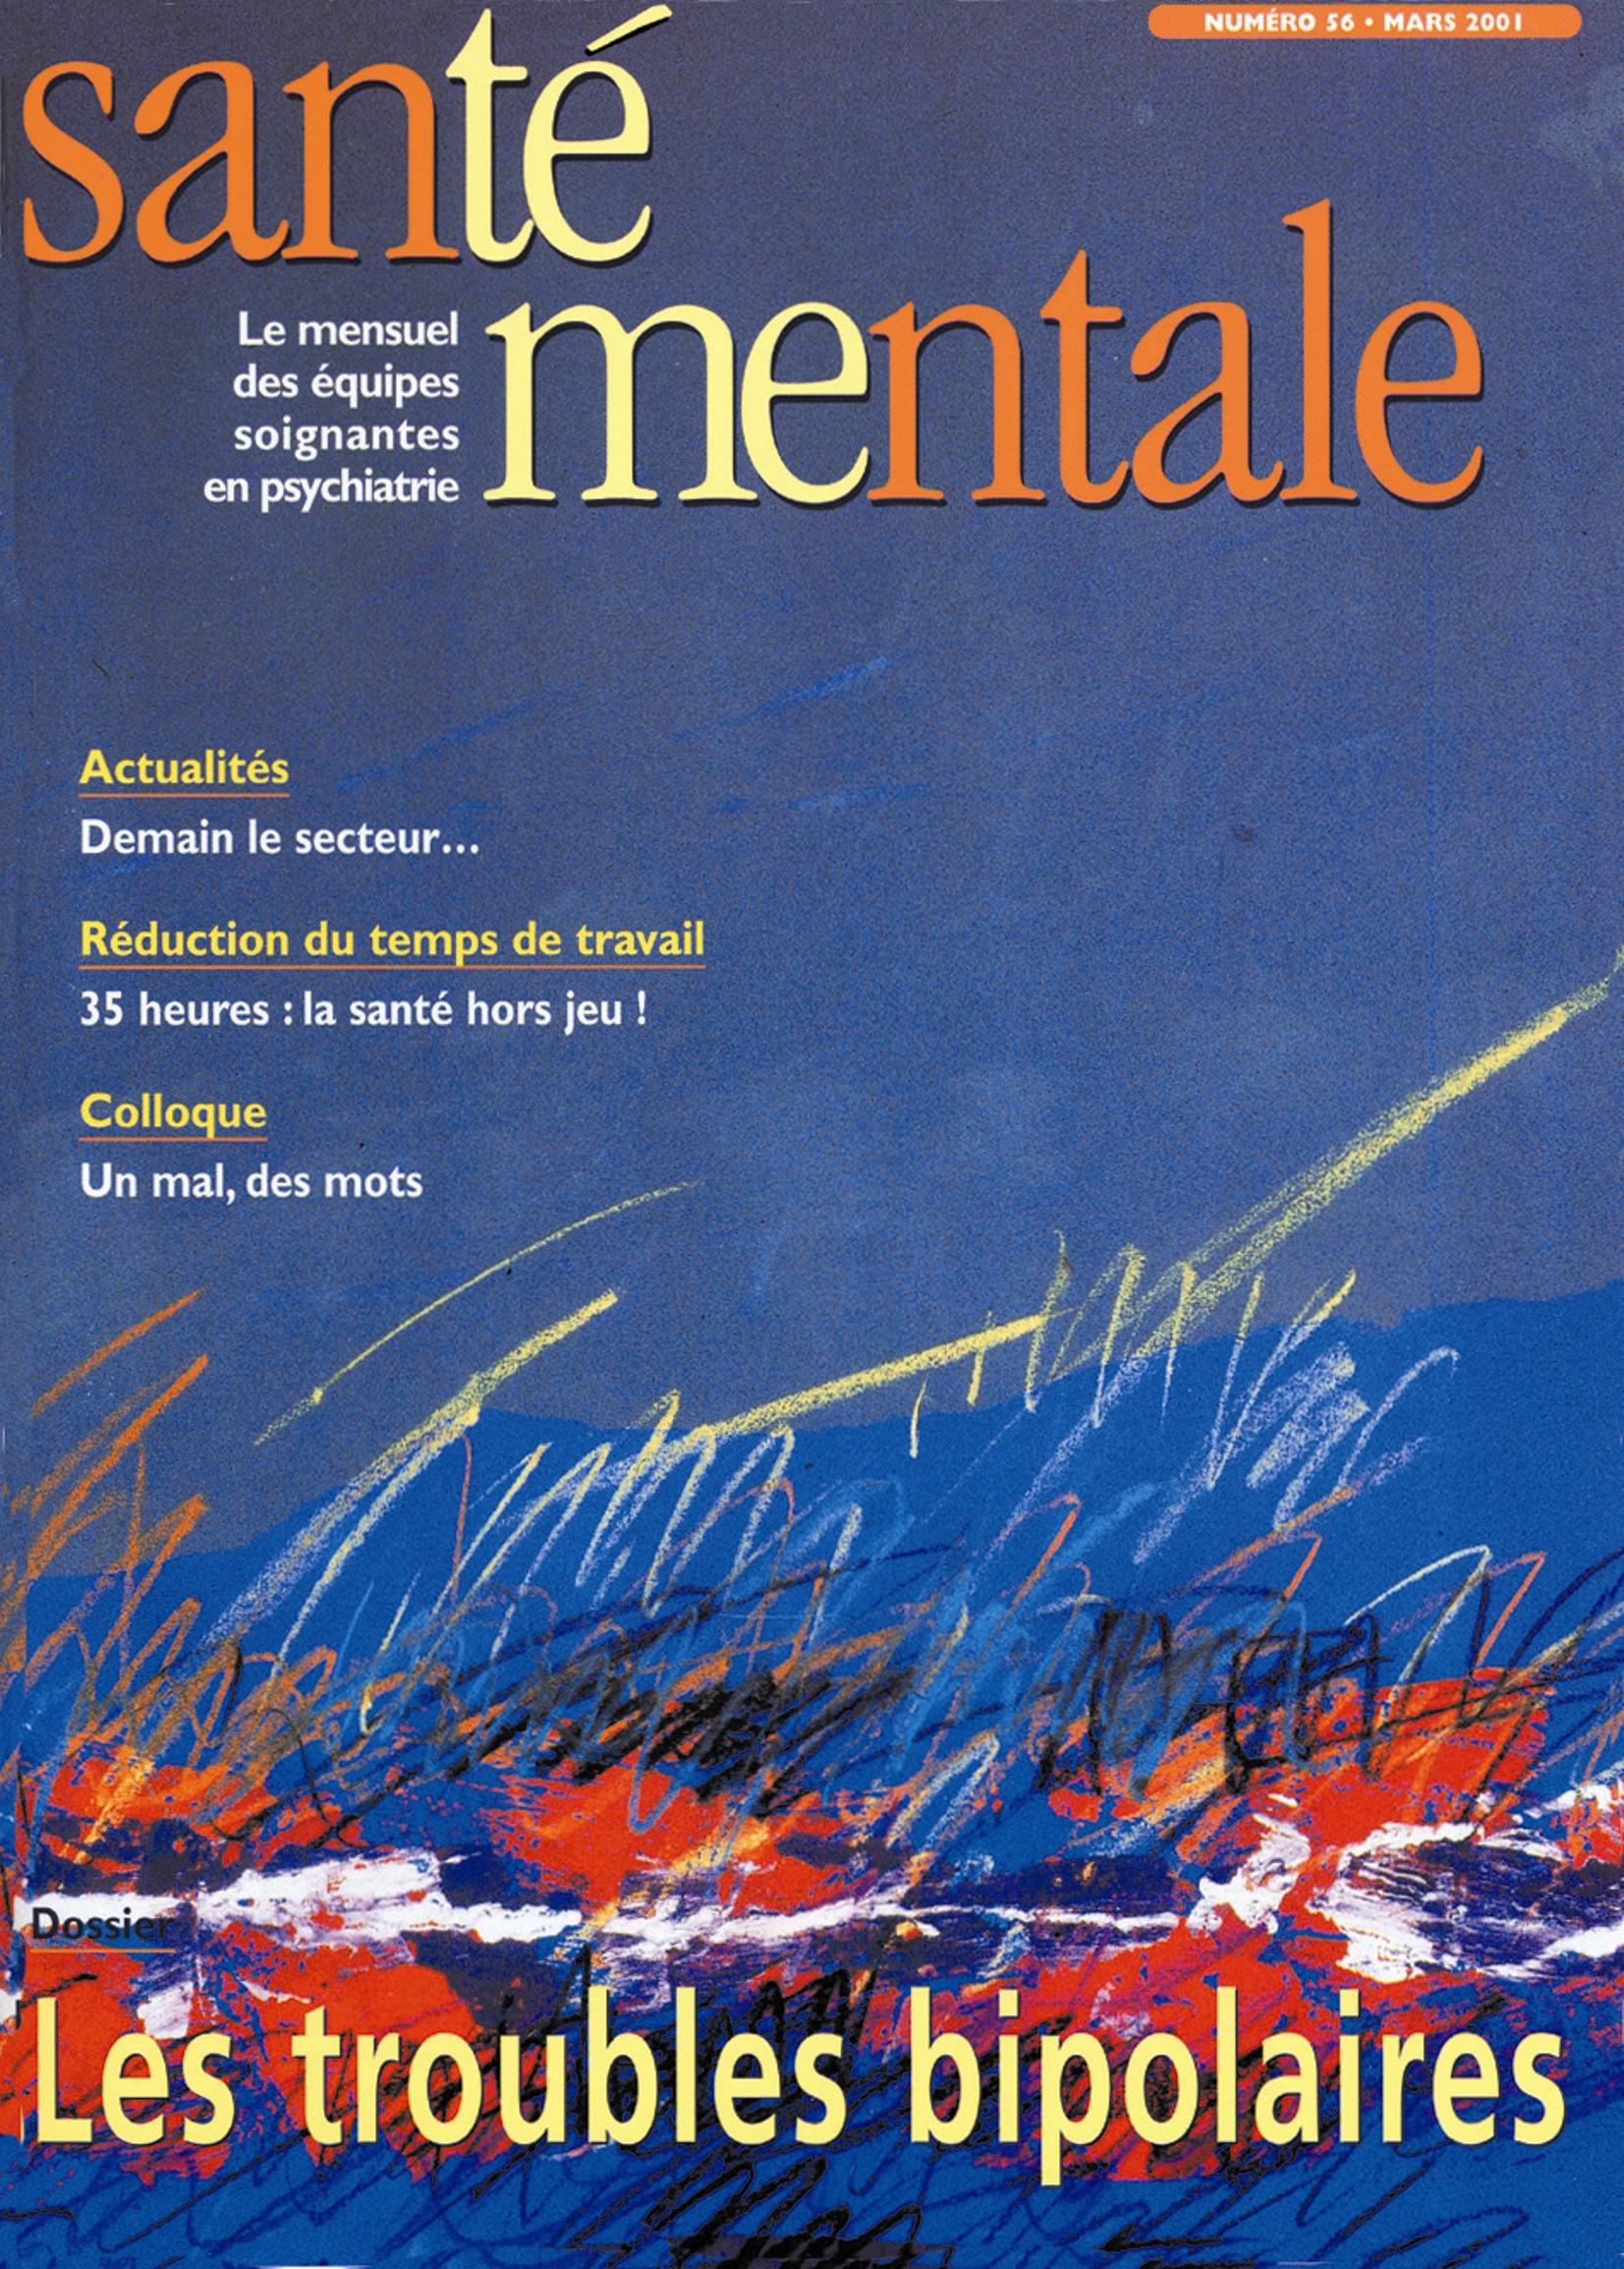 Couverture N°56 mars 2001